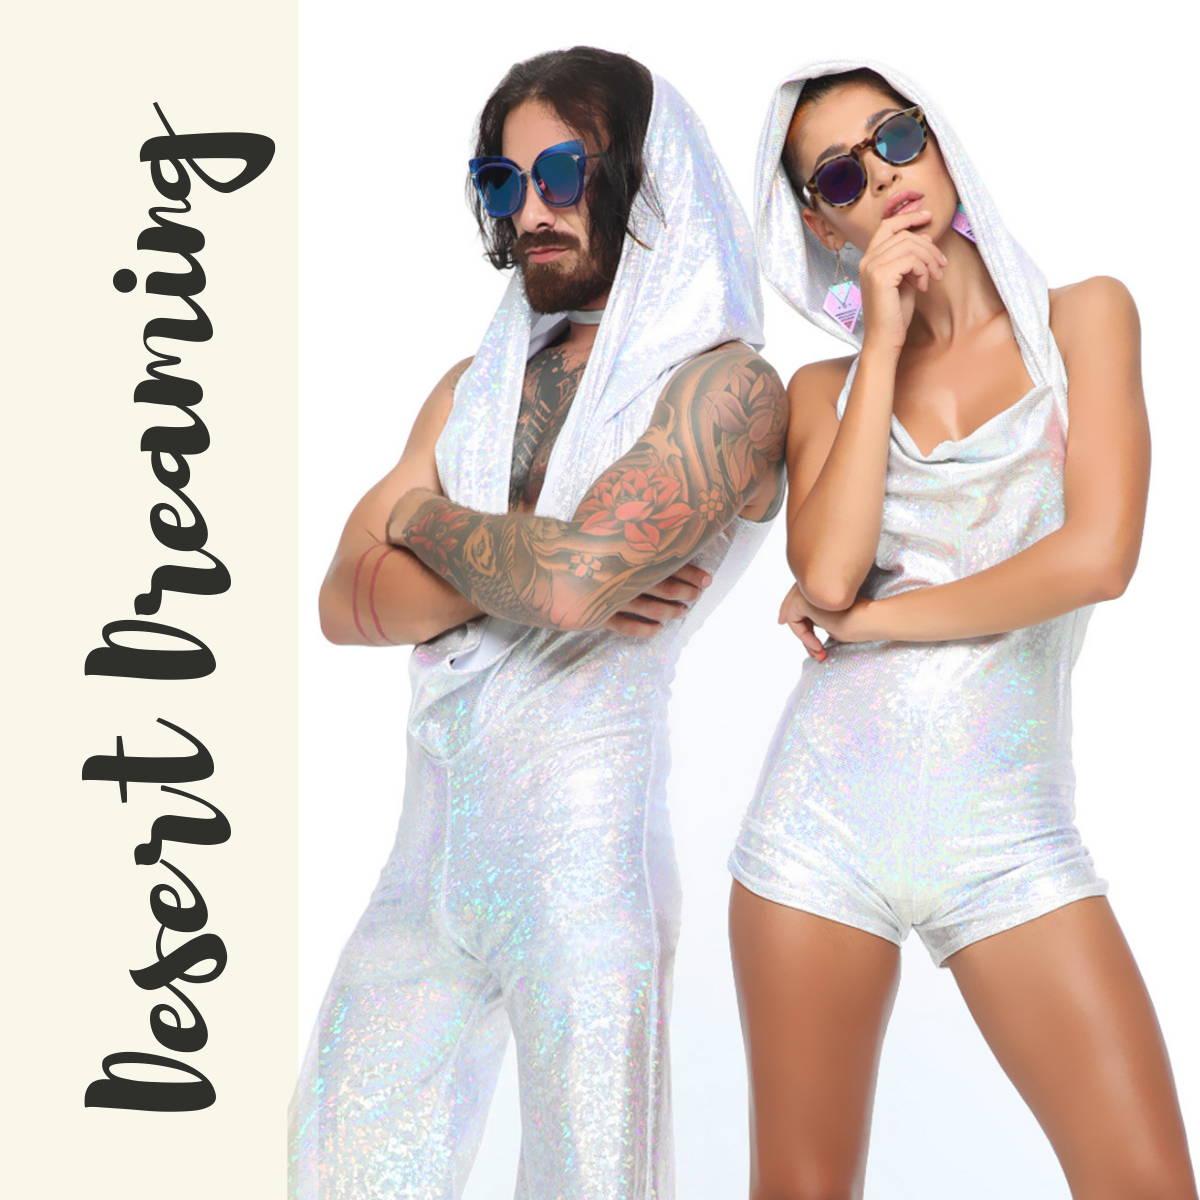 Burning Man Costumes by Sea Dragon Studio